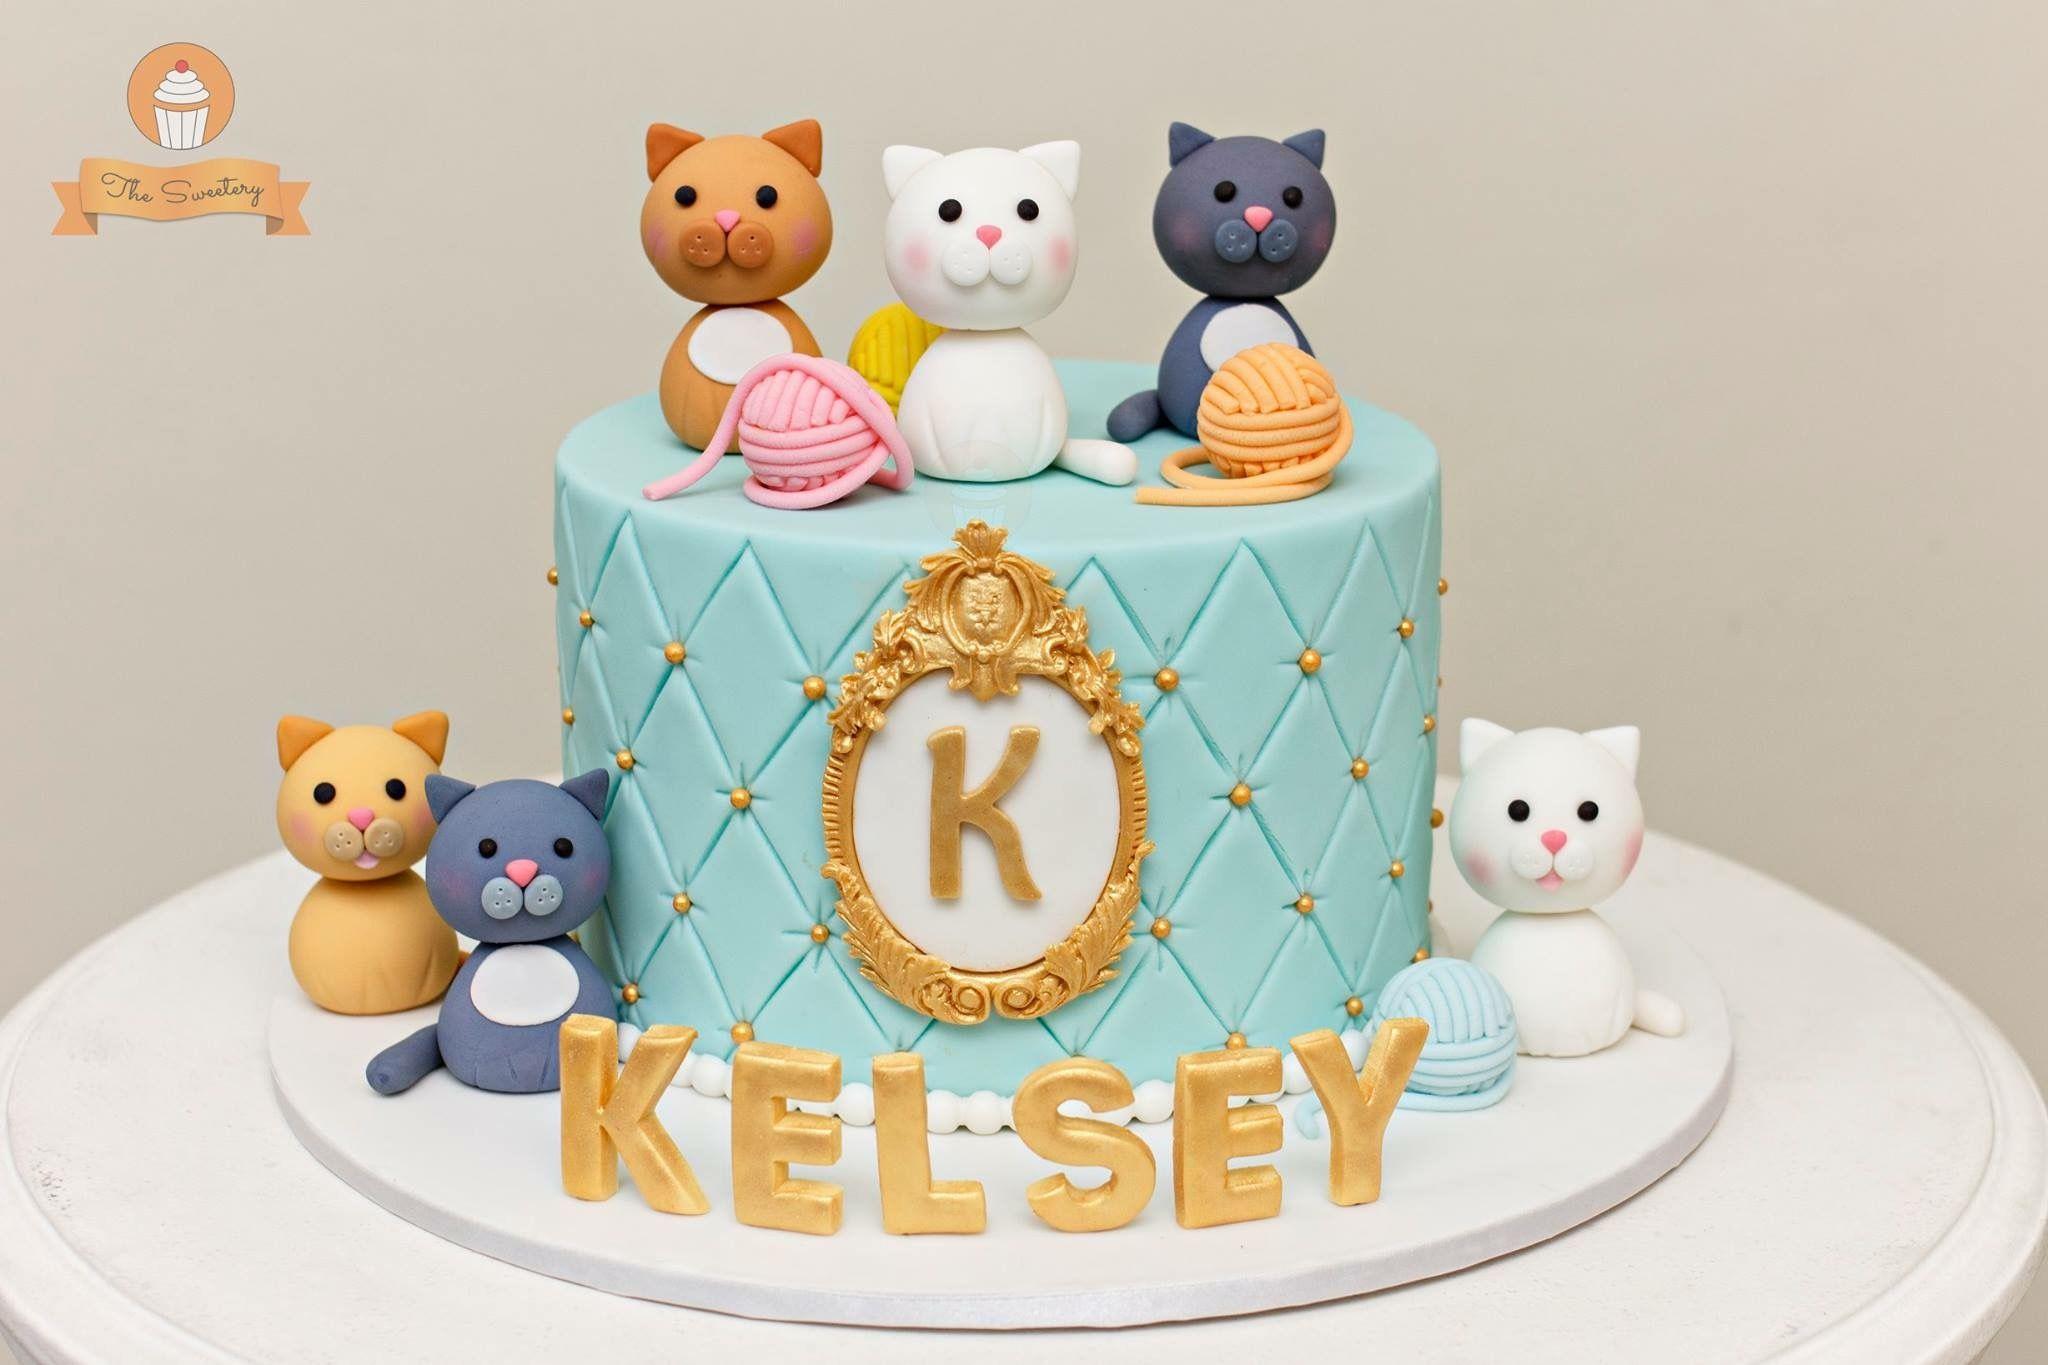 Terrific Cat Cake Cats Cake Kittens Catcake The Sweetery By Diana Funny Birthday Cards Online Ioscodamsfinfo